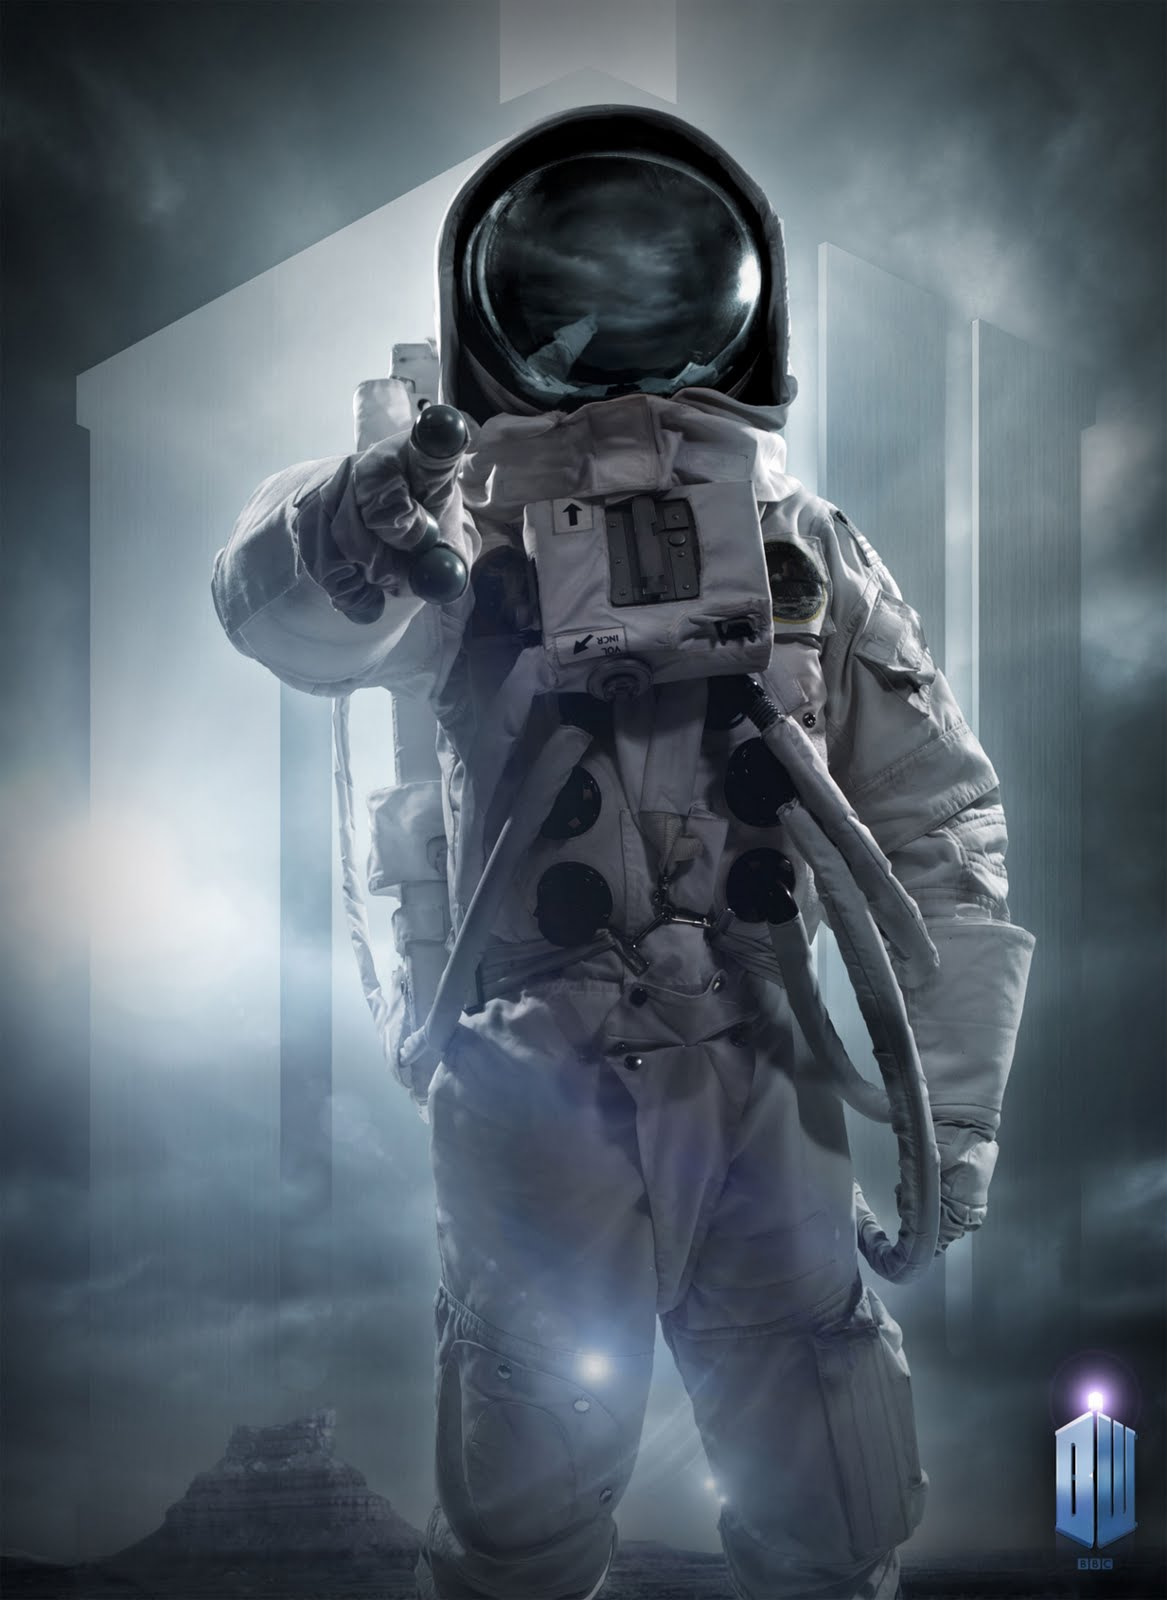 http://4.bp.blogspot.com/-TiZ3MCDm5dA/Ta8y7jsPzpI/AAAAAAAAKW8/iHzKOCkHXzY/s1600/Impossible+Astronaut.jpg